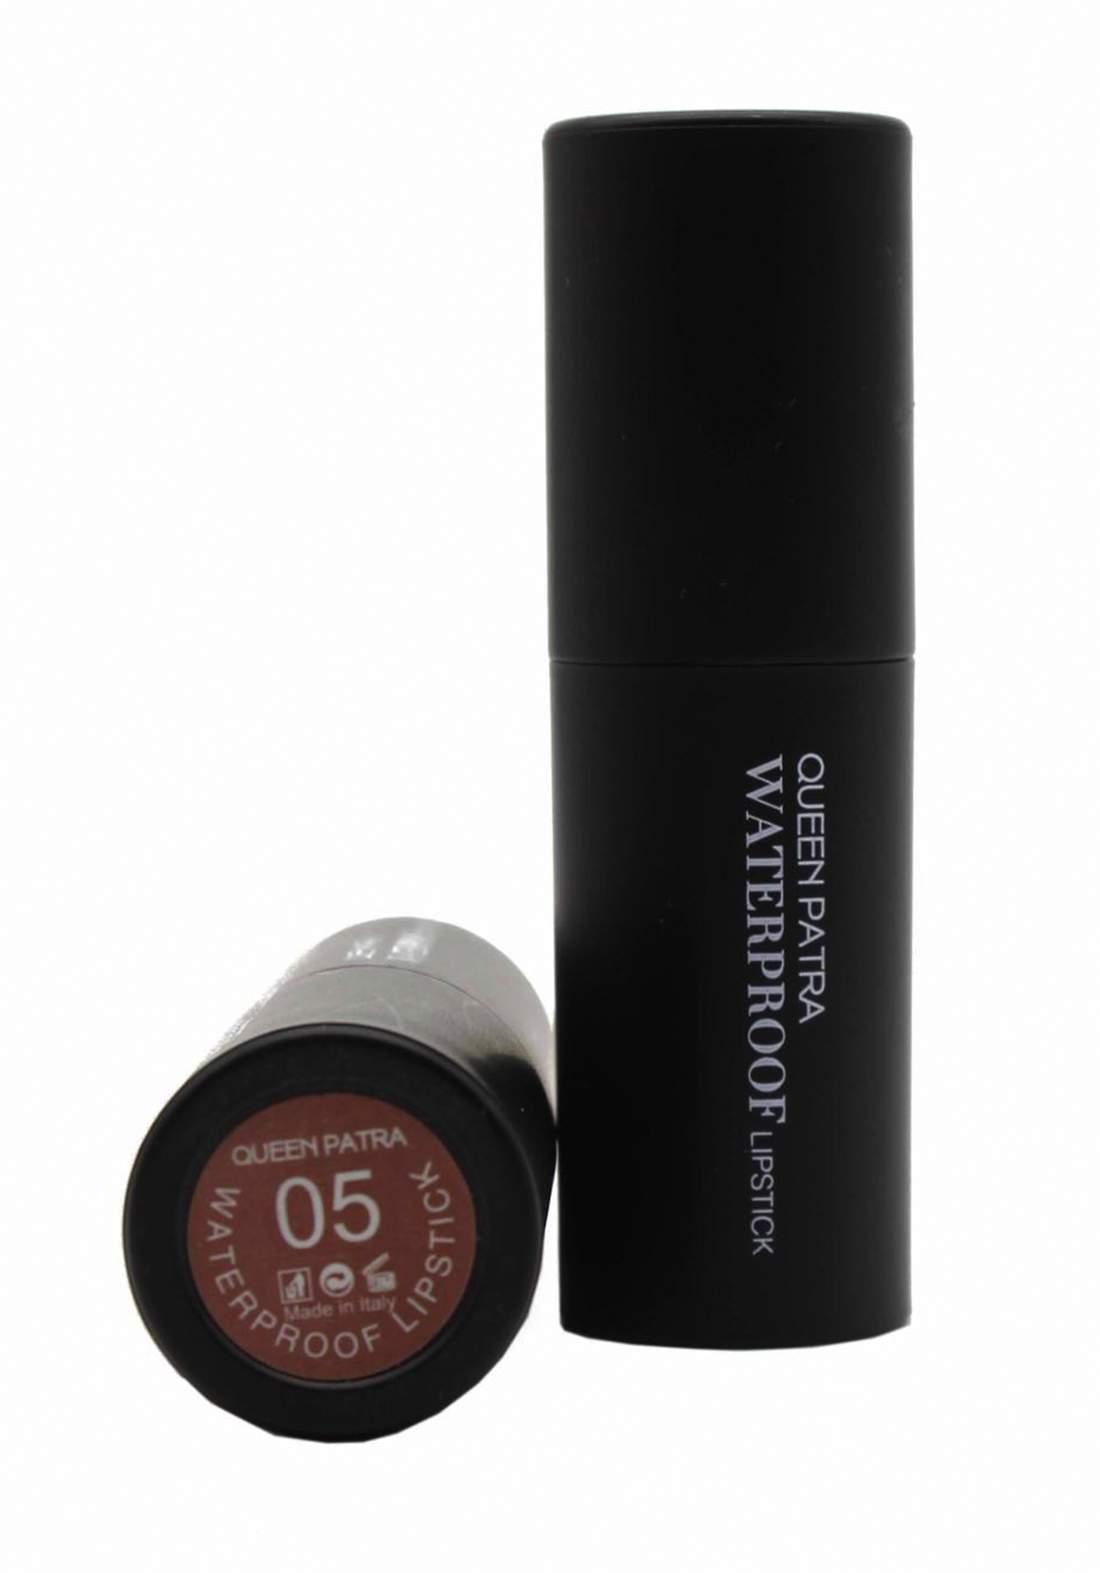 Queen Batra Waterproof Lipstick No.05 احمر شفاه